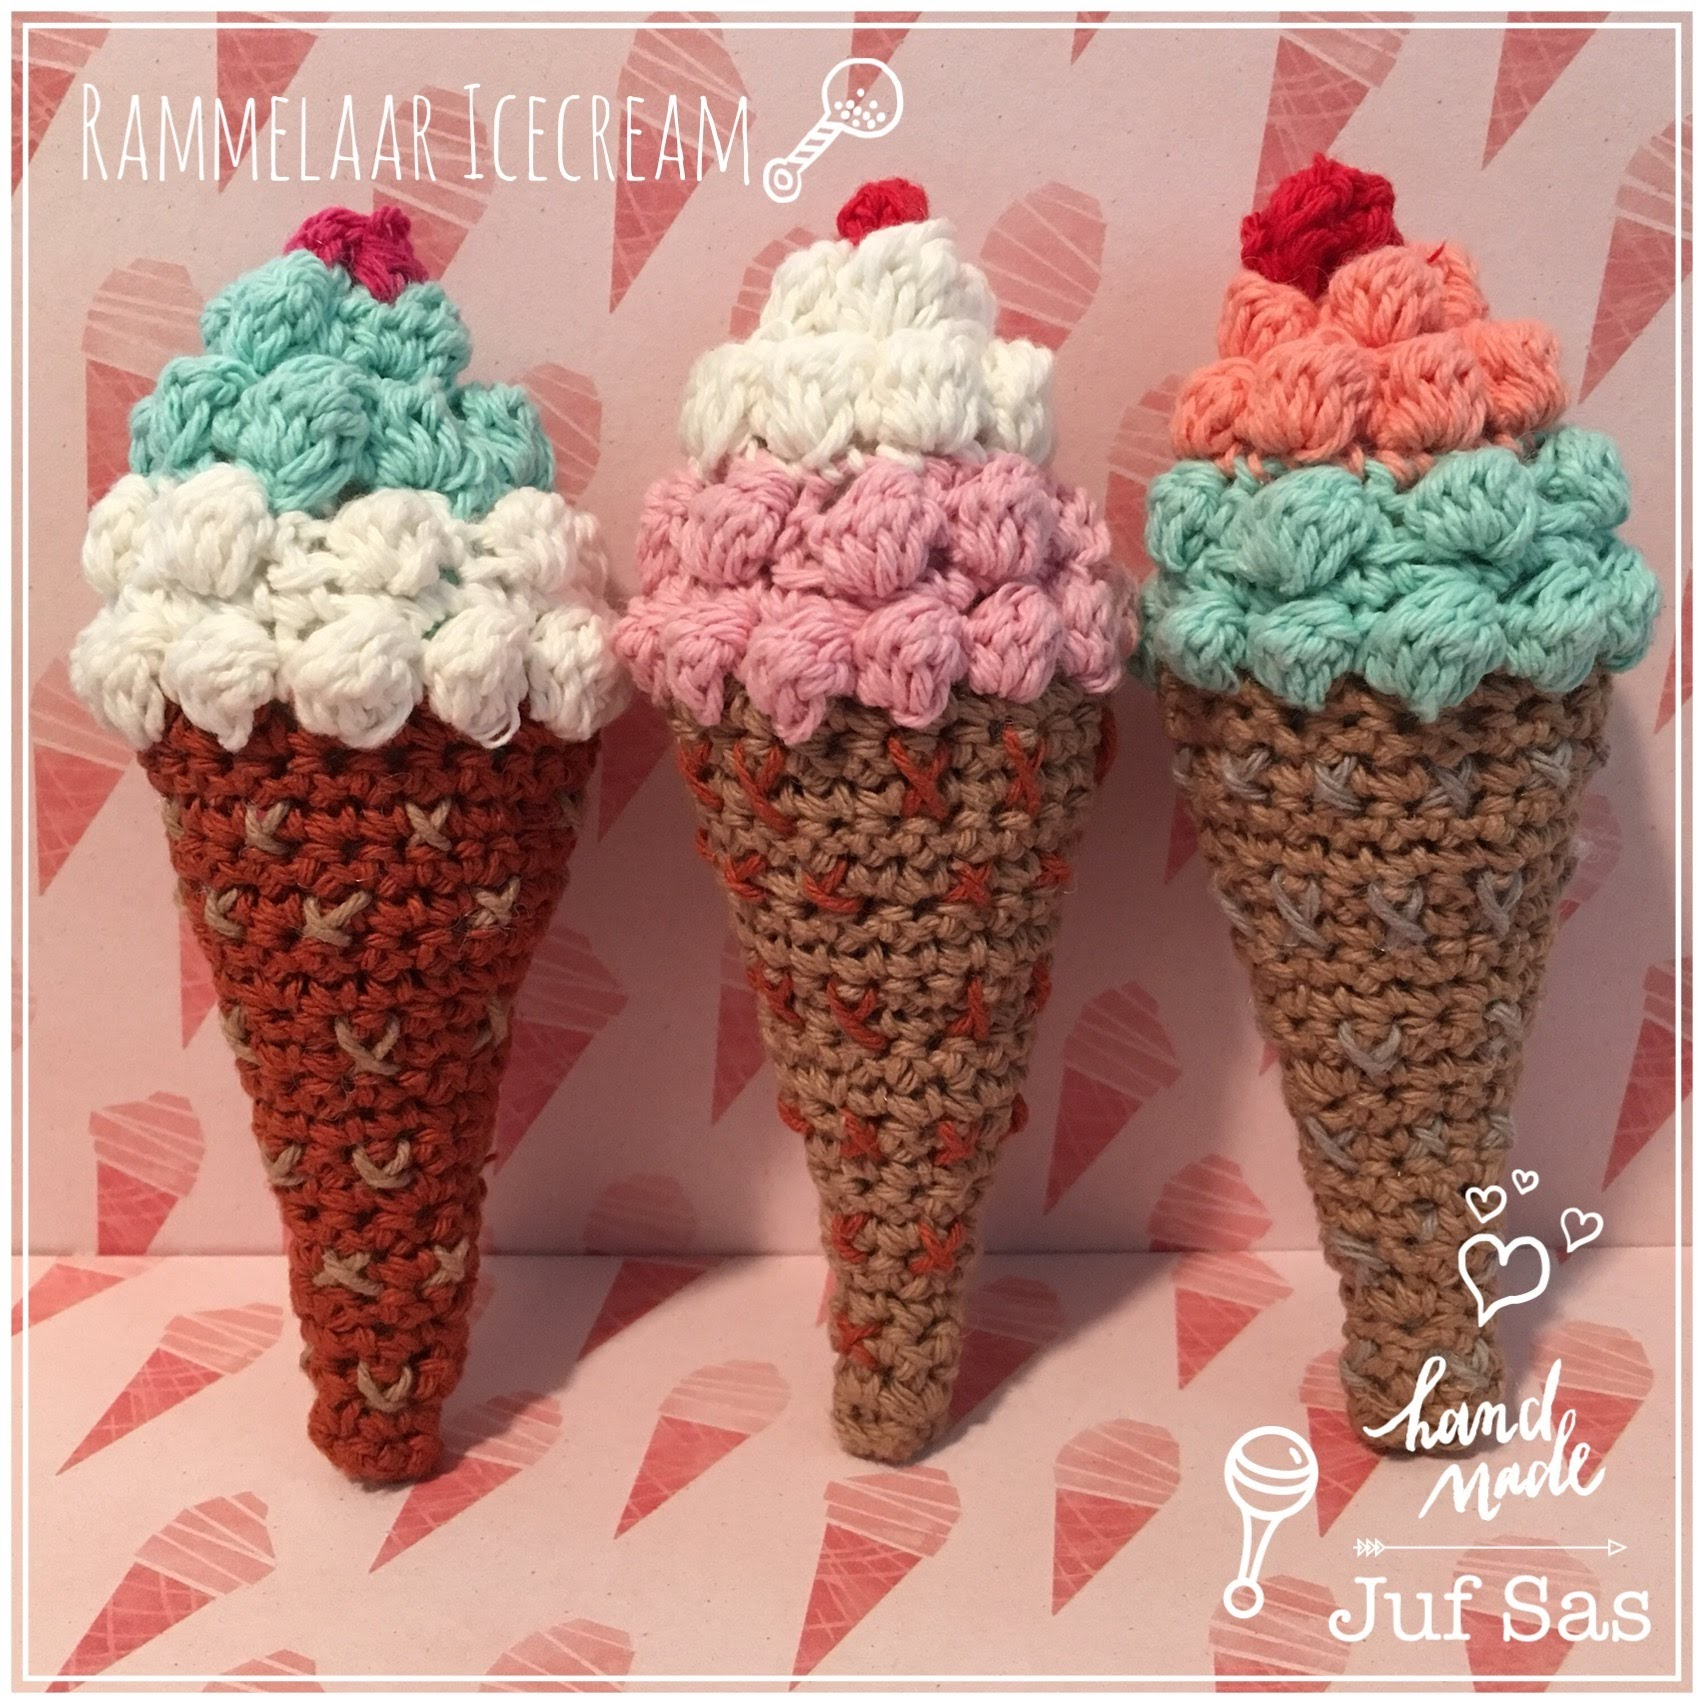 Rammelaar Icecream